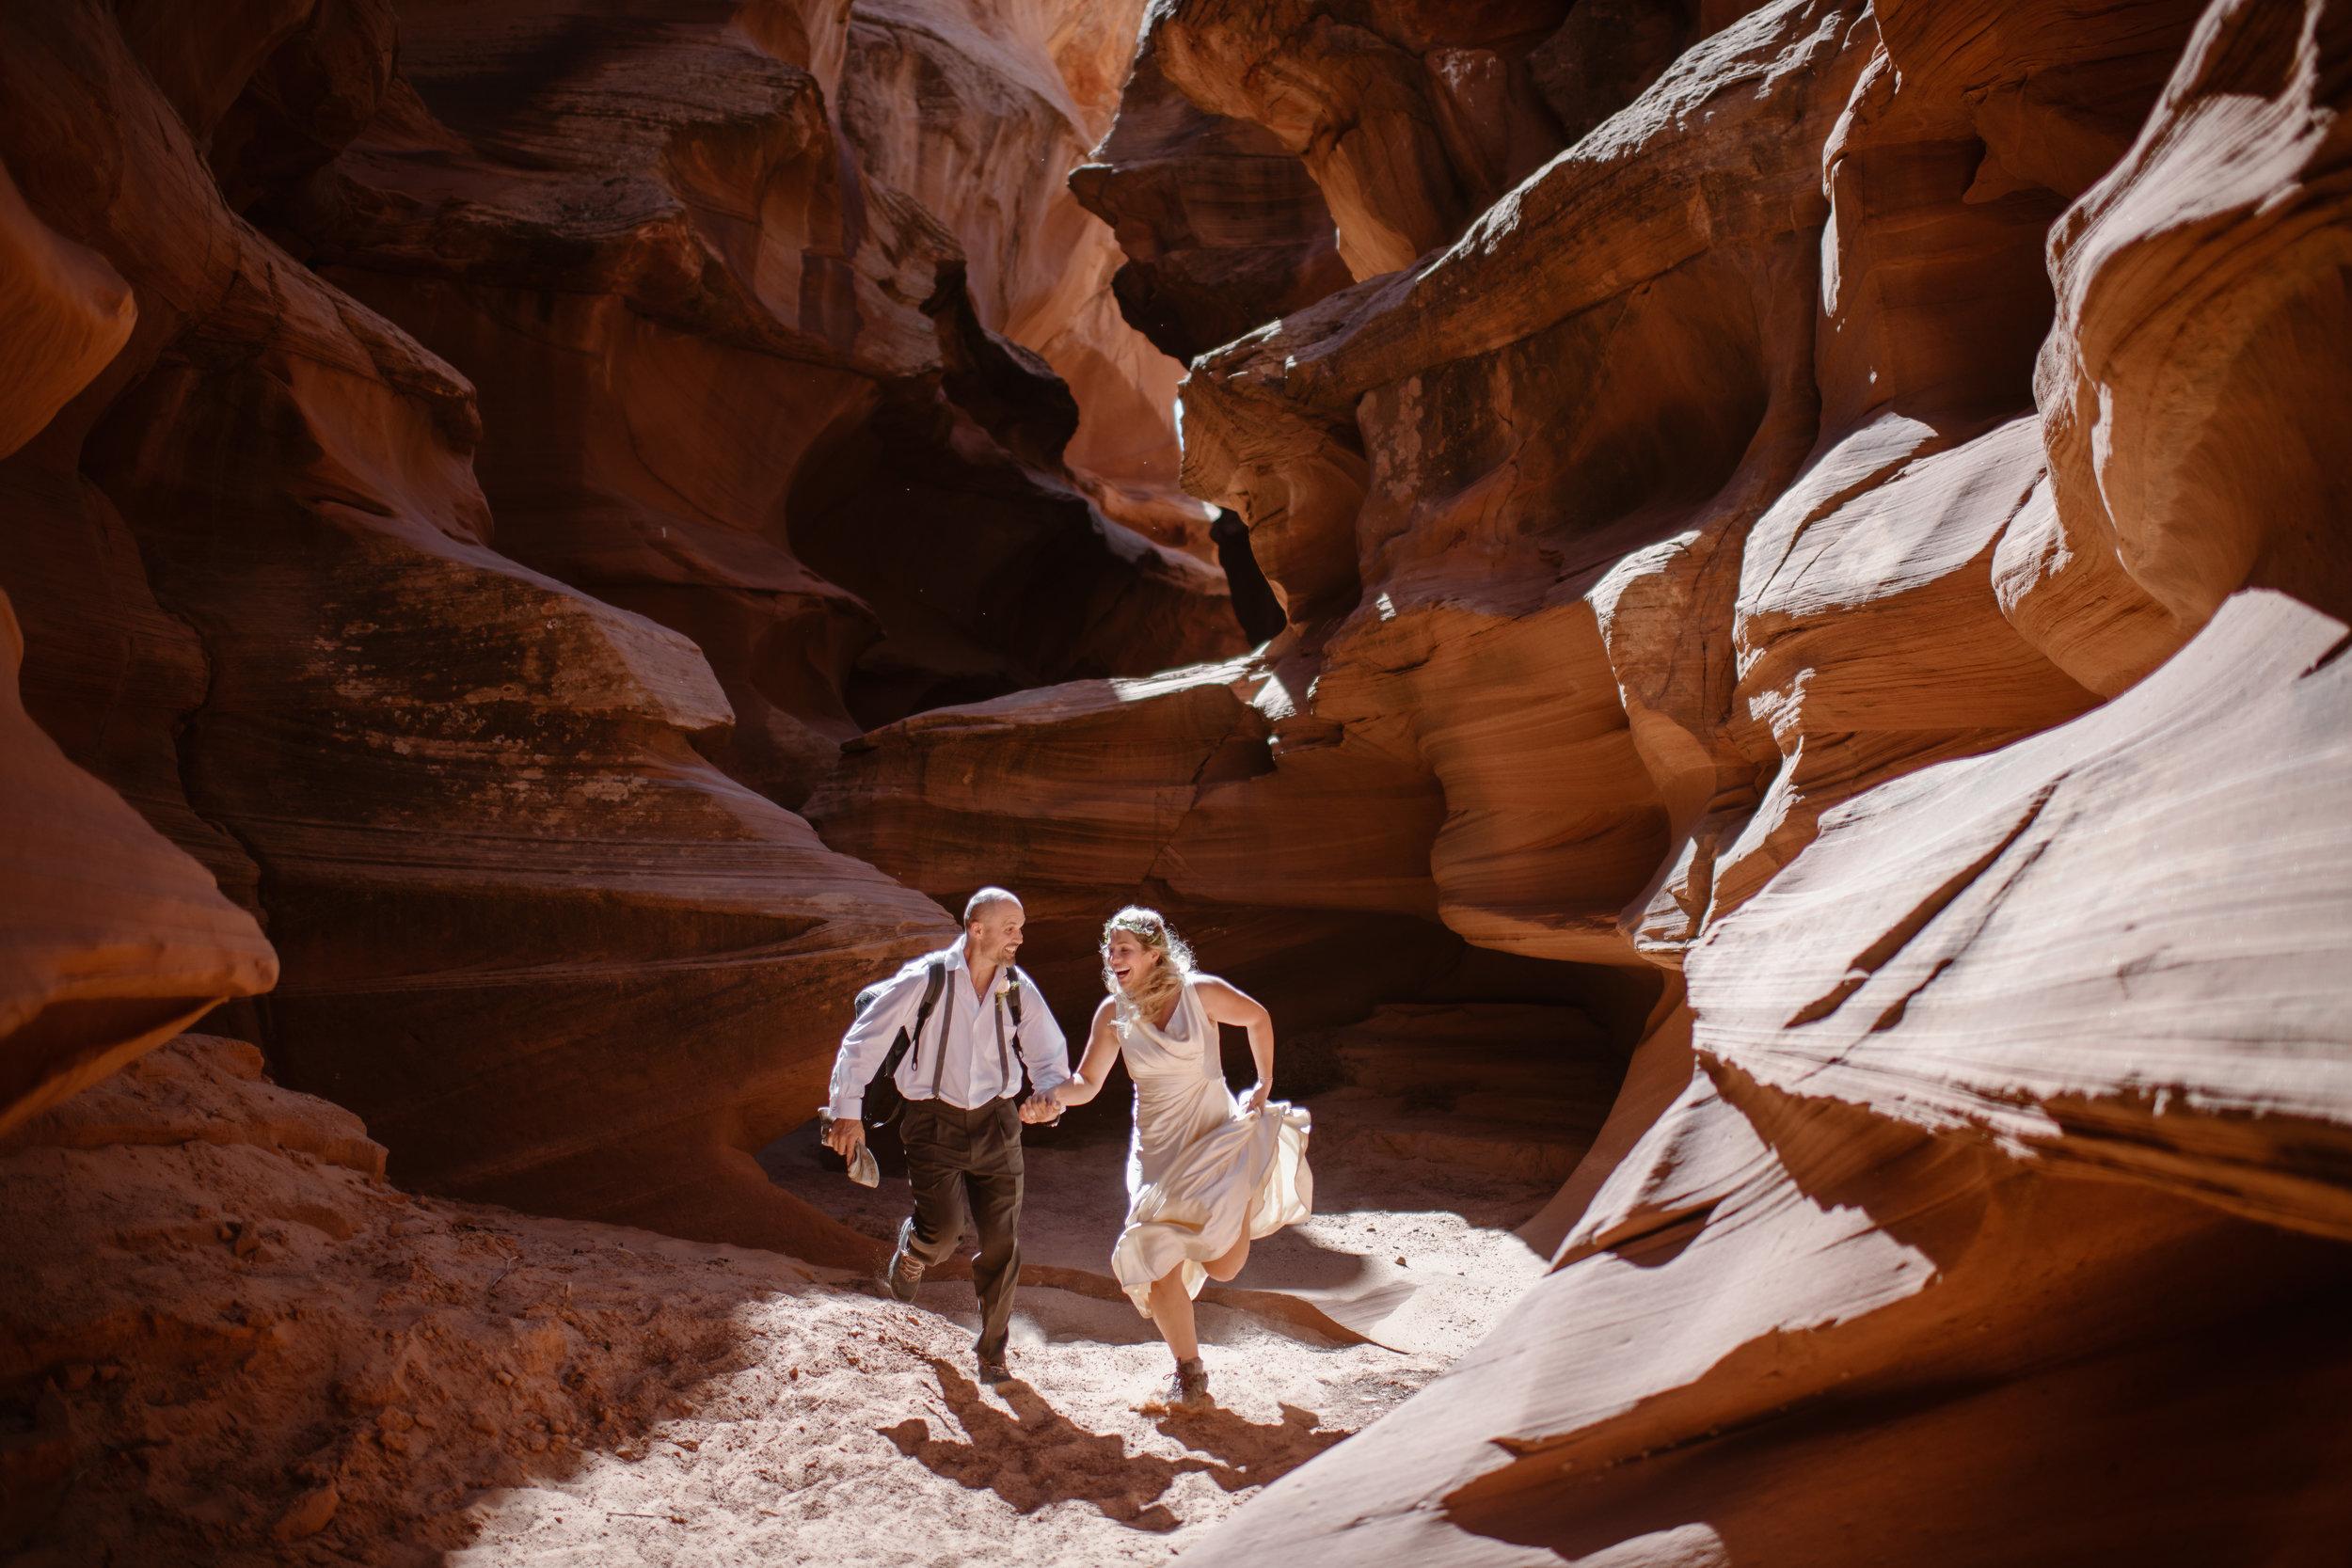 adventure-wedding-photographer-workshop-how-to-become-an-elopement-photographer-workshop-maddie-mae-adventure-instead